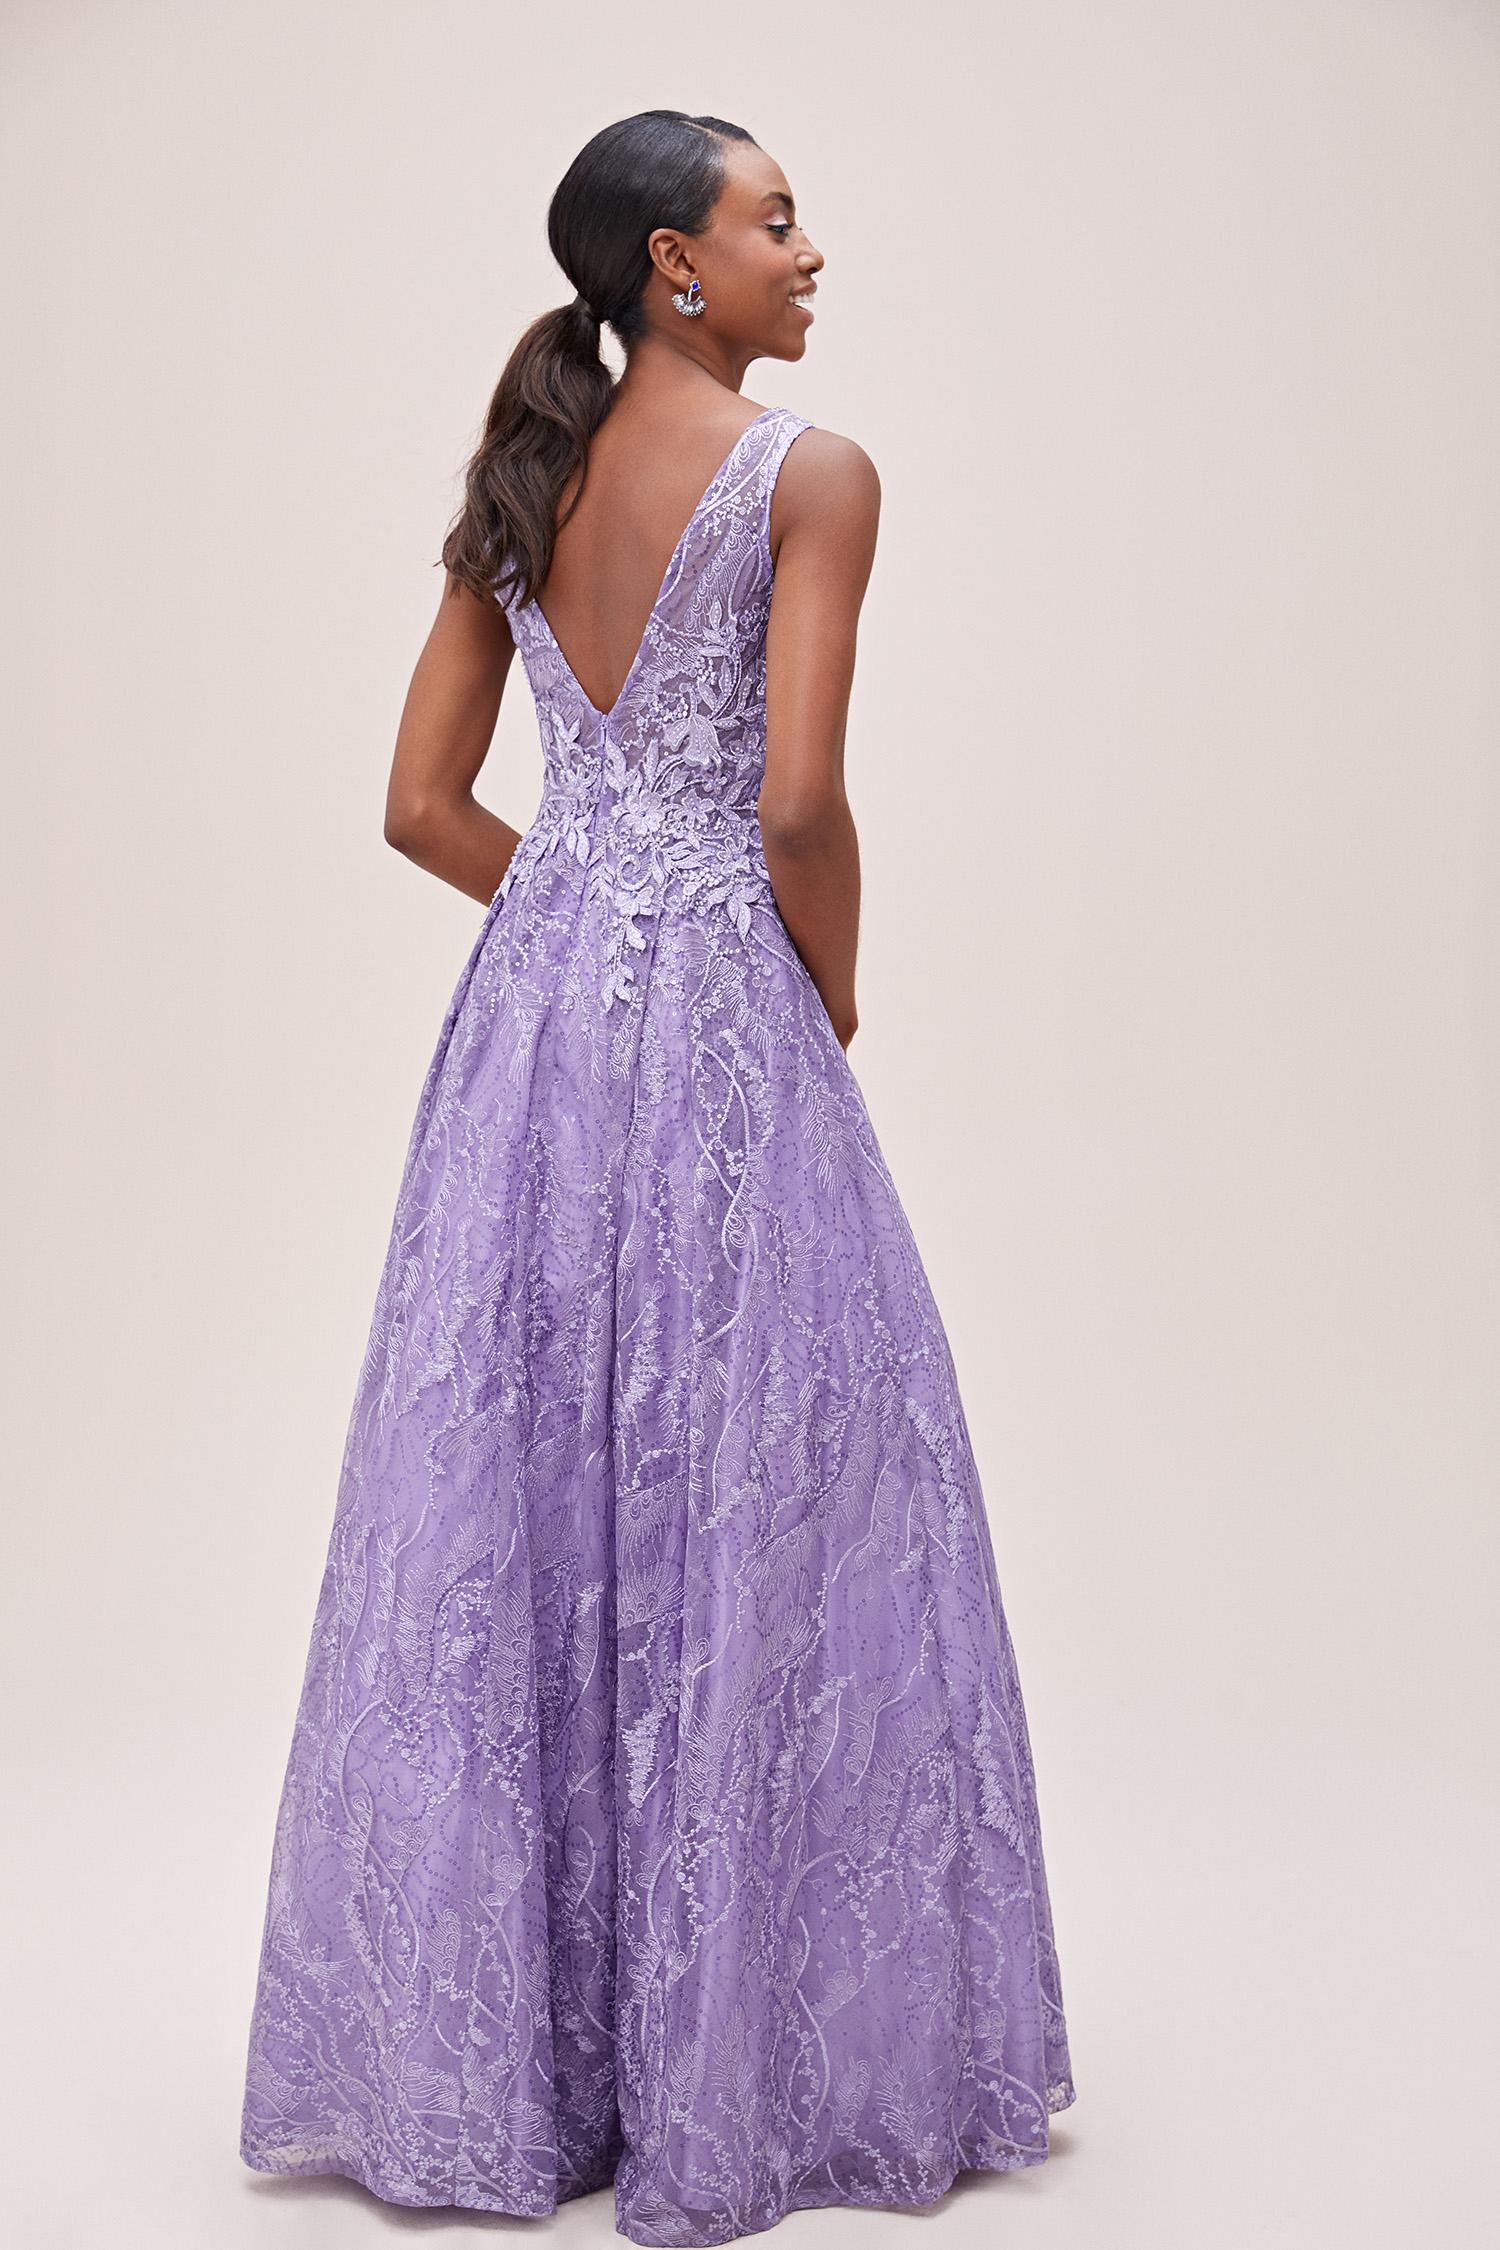 Lavanta Rengi V Yaka Askılı Prenses Abiye Elbise - Thumbnail